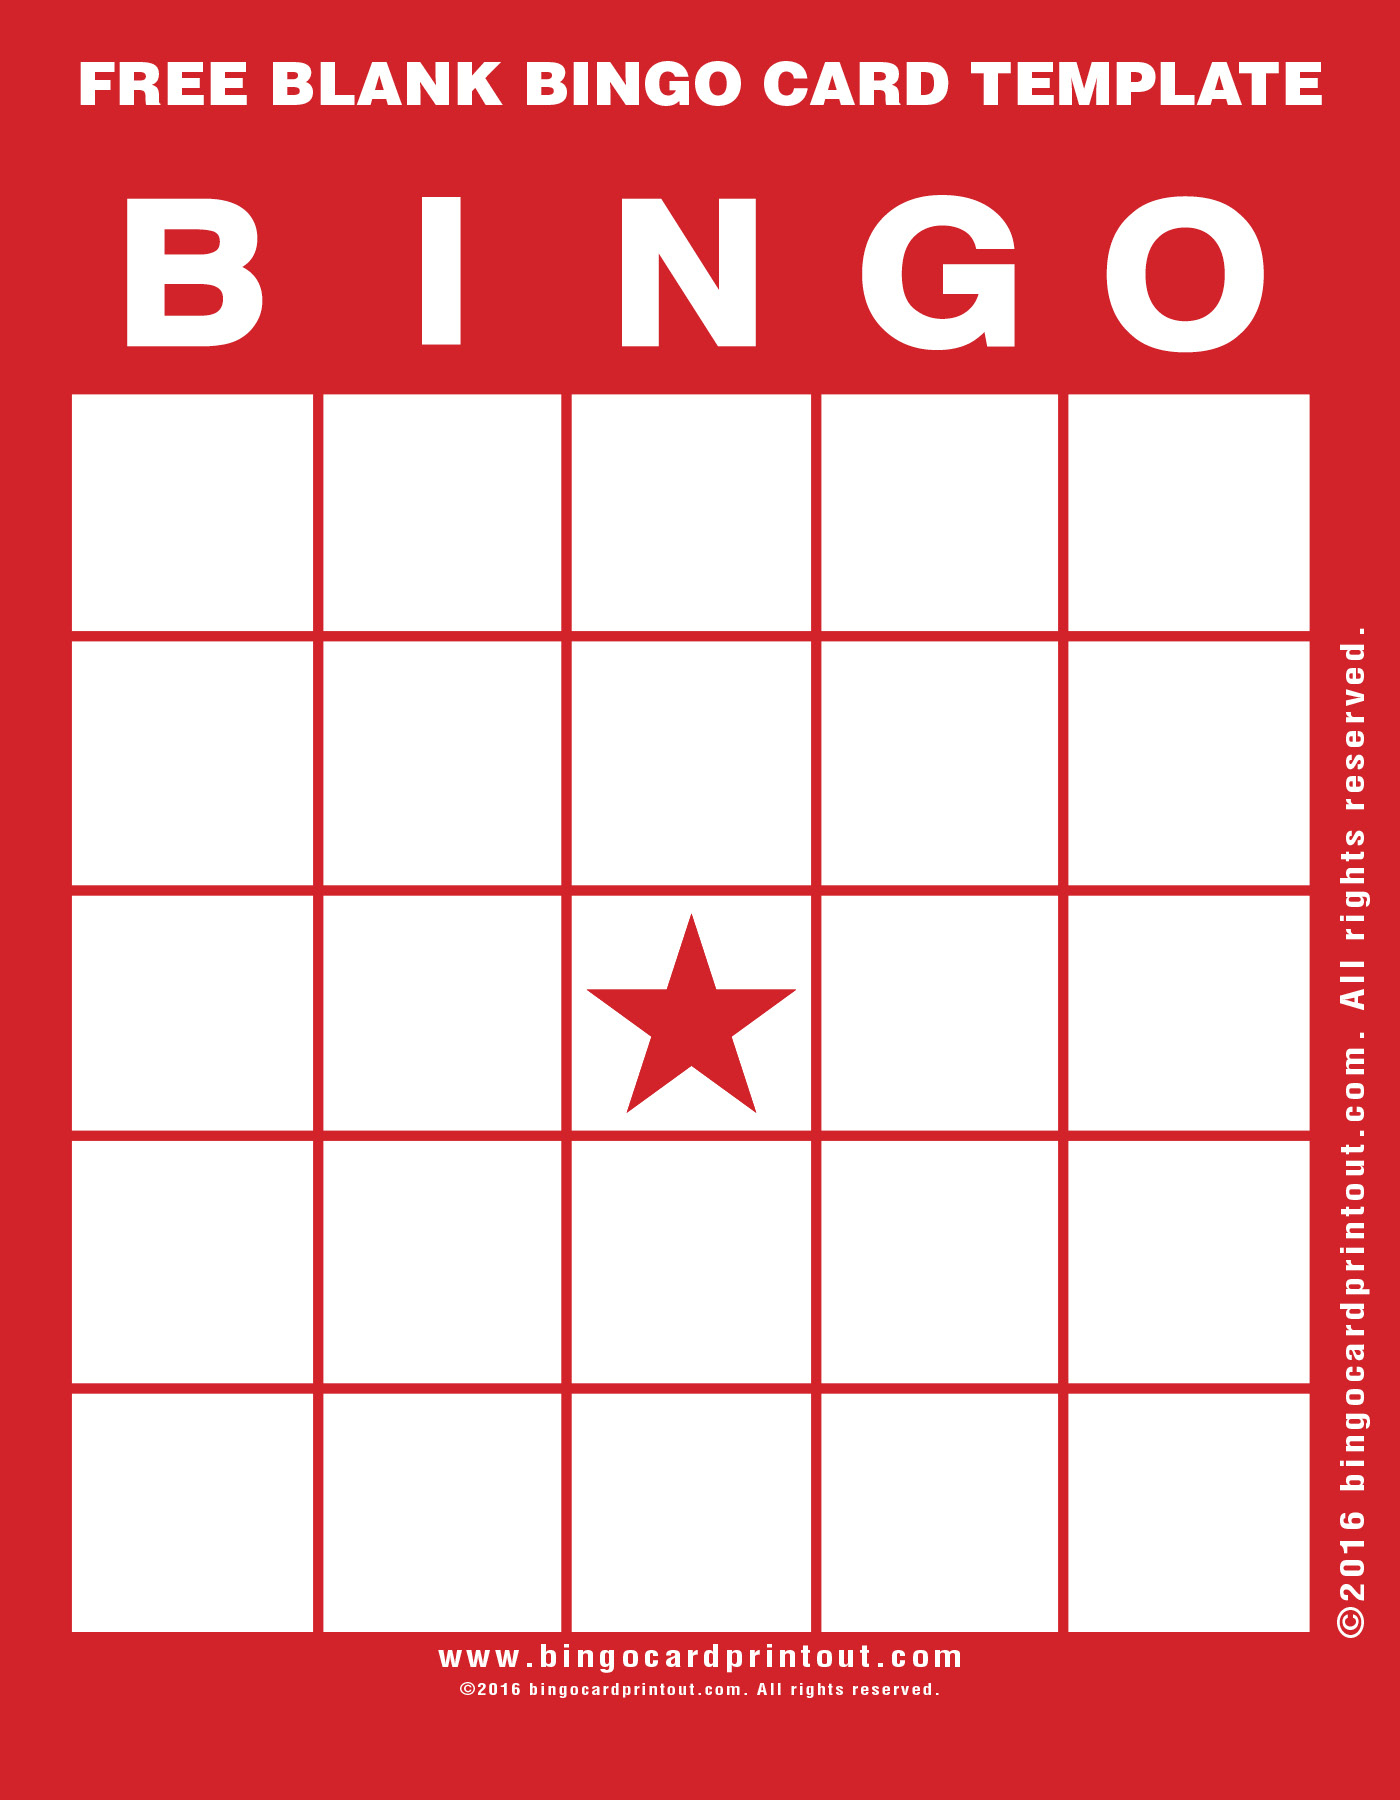 Free Blank Bingo Card Template - Bingocardprintout